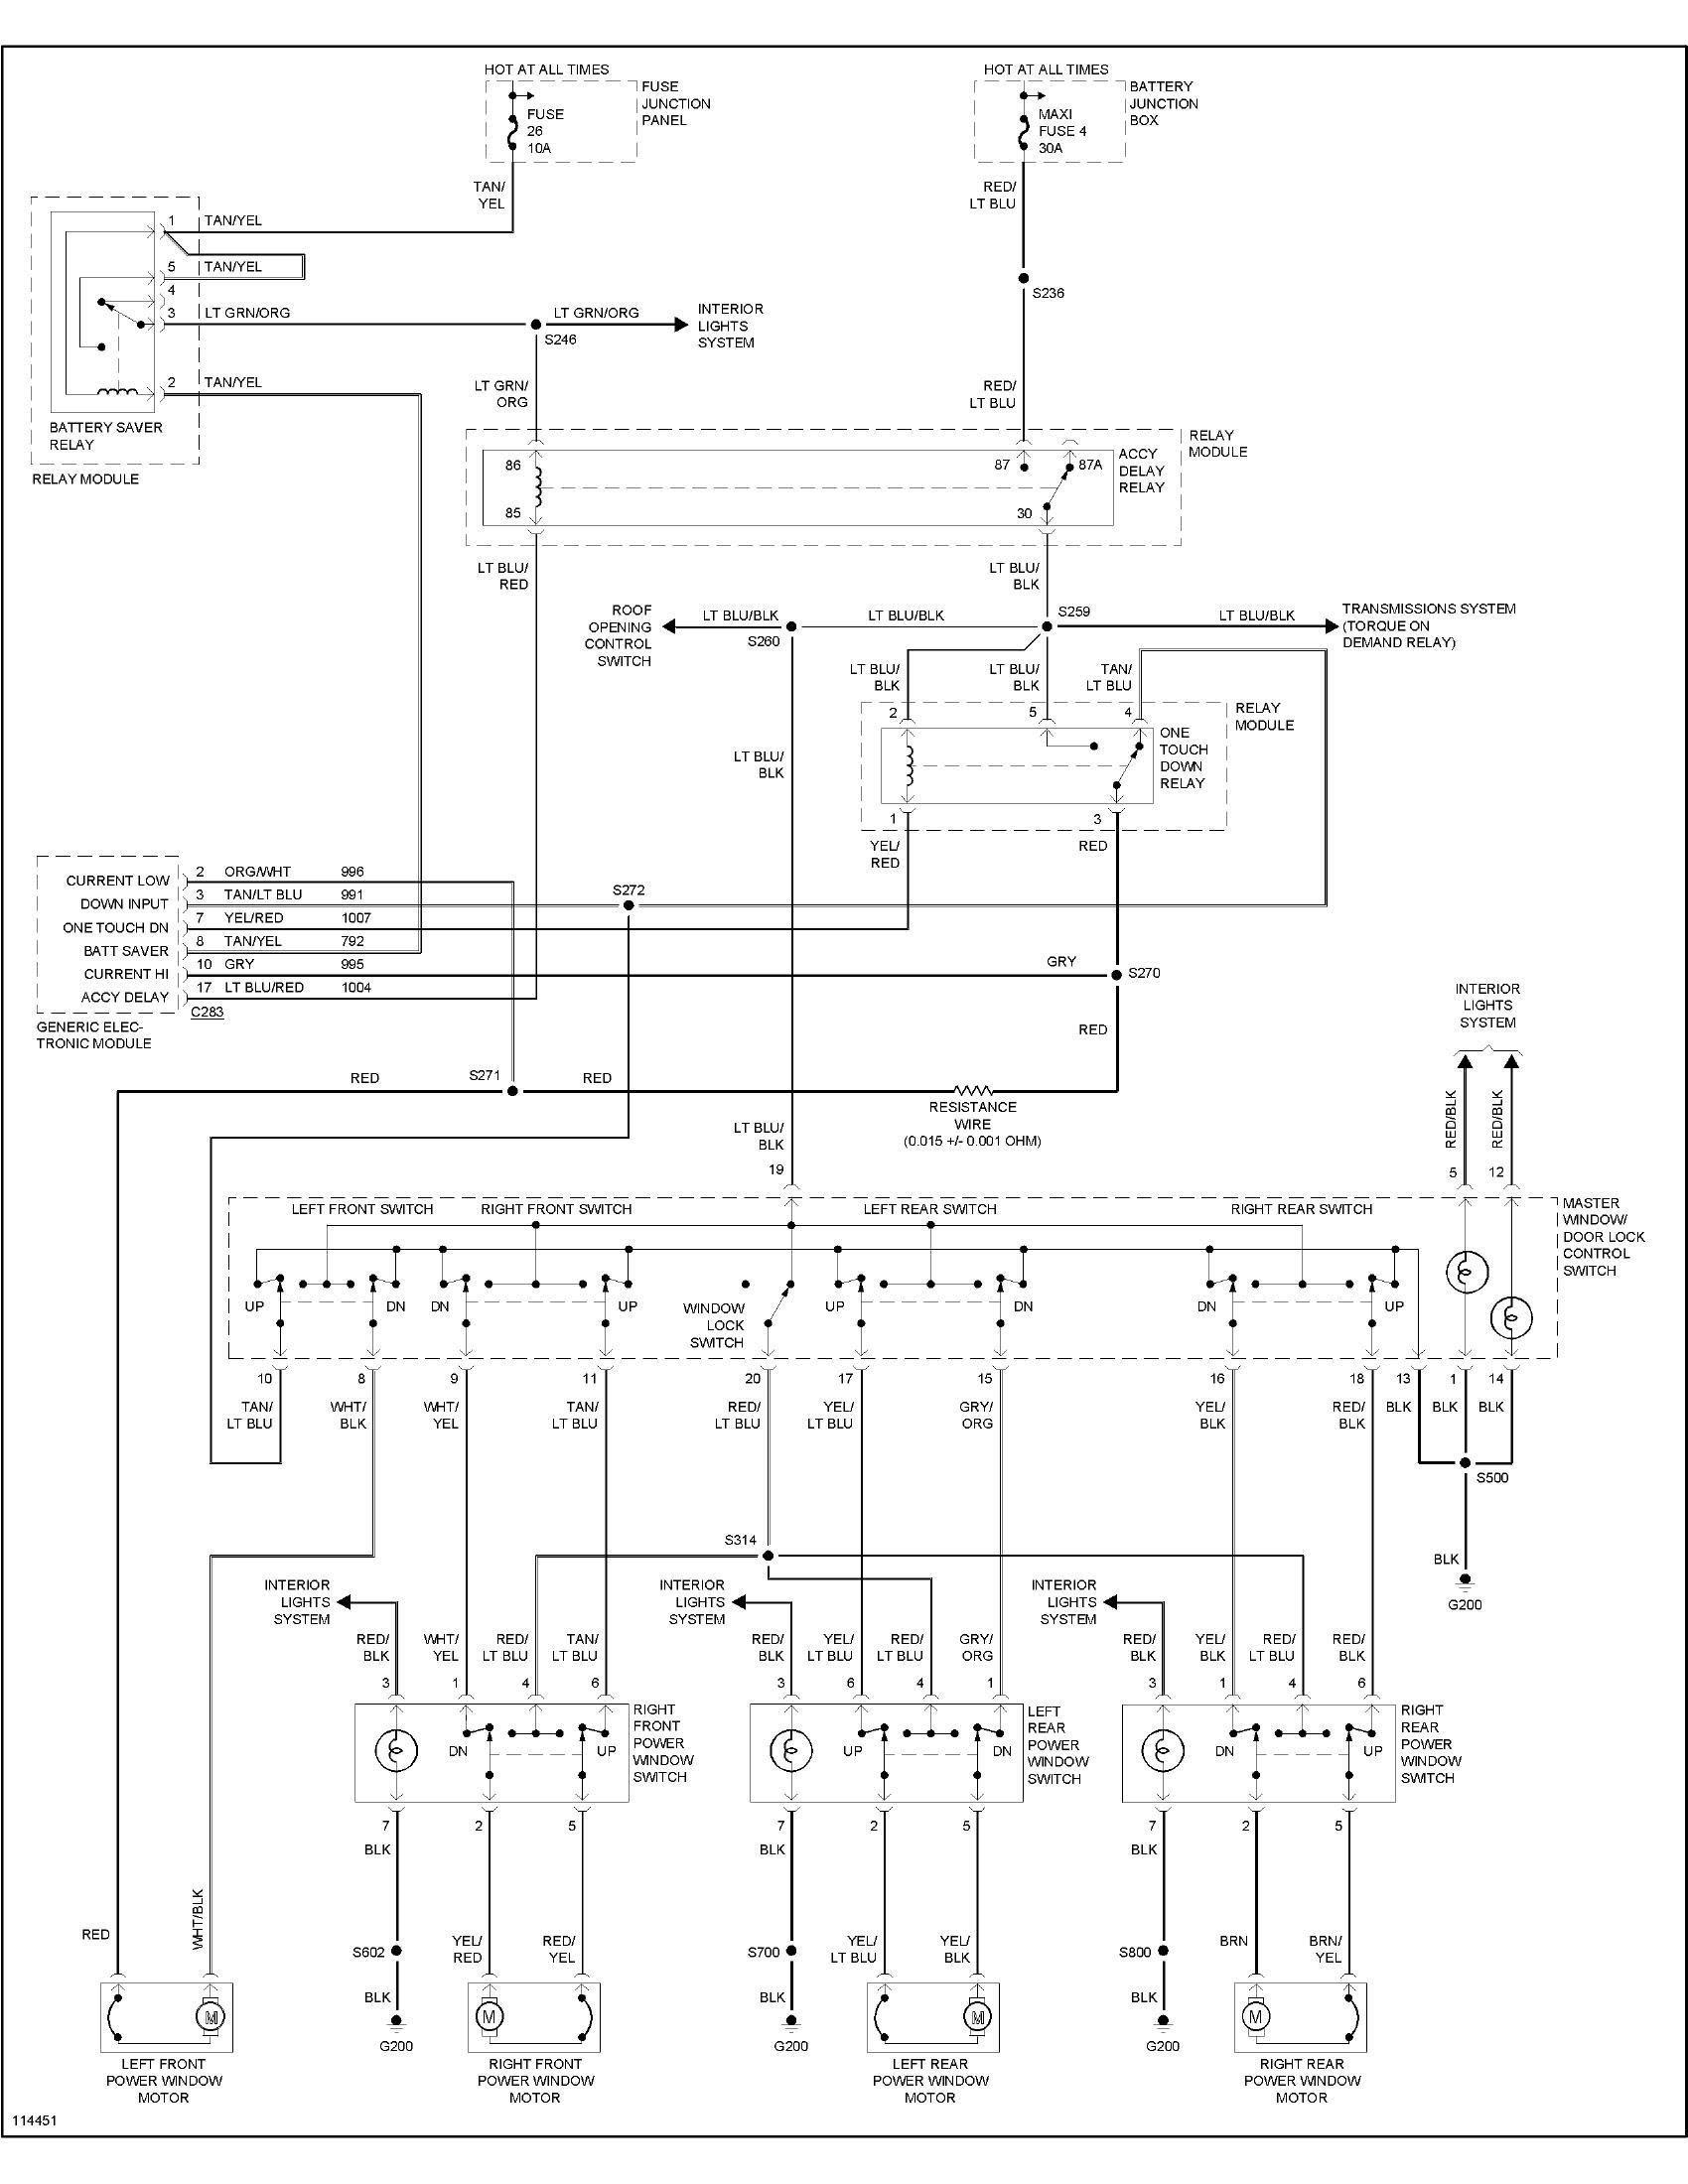 2003 Ford Explorer Wiring Diagram - Wiring Diagram Direct fast-tiger -  fast-tiger.siciliabeb.it | Wiring Diagram For 2003 Ford Explorer |  | fast-tiger.siciliabeb.it